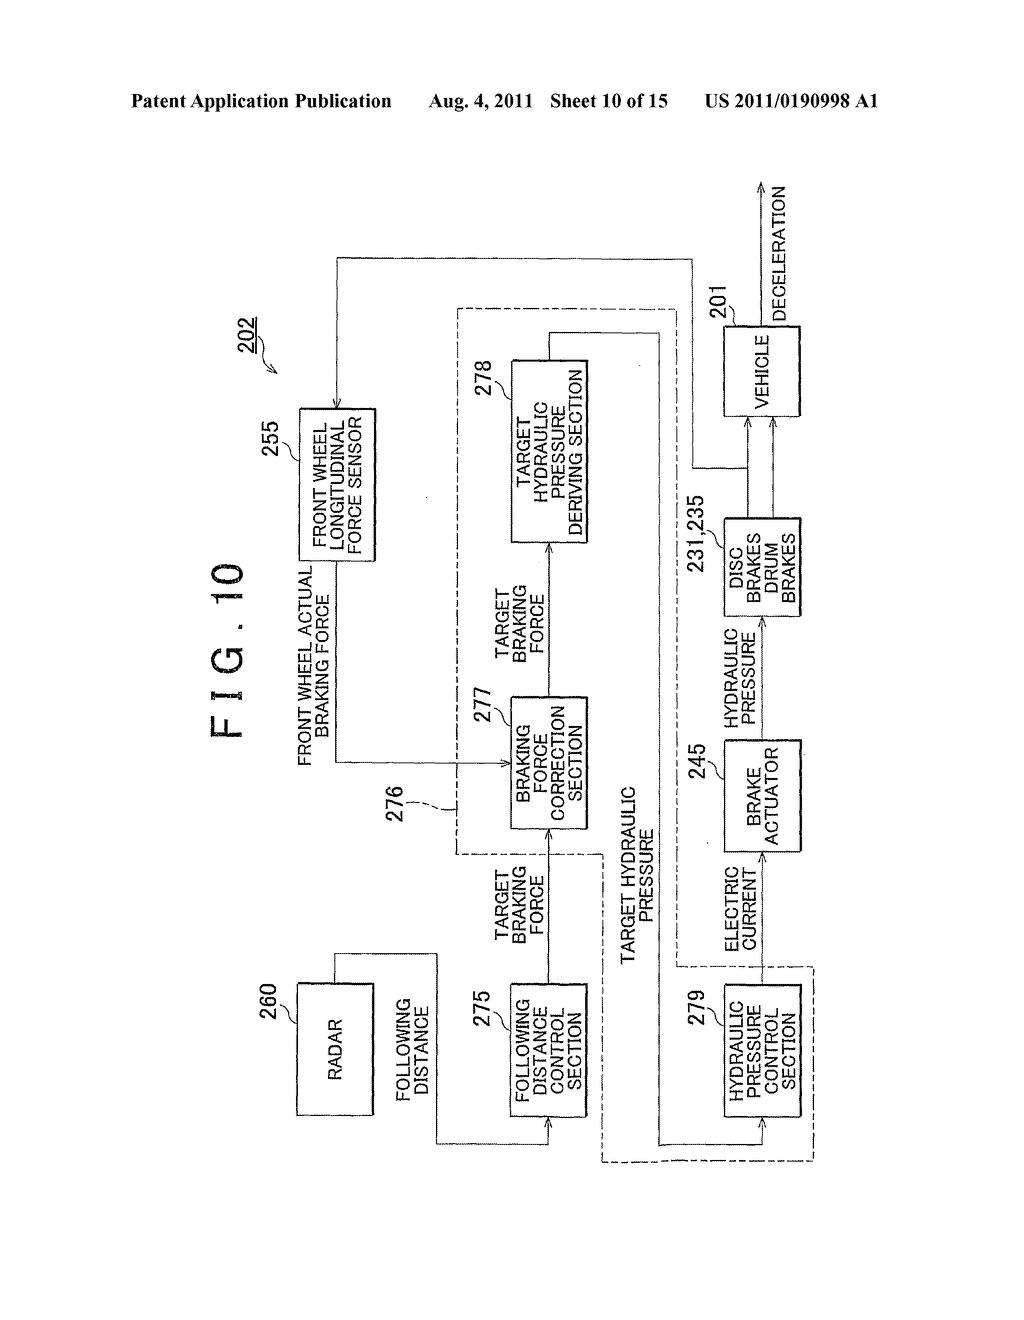 Brake System Schematic Car Diagram Electropneumatic Brakes Automatic Vehicle Braking And Method Image 1024x1320